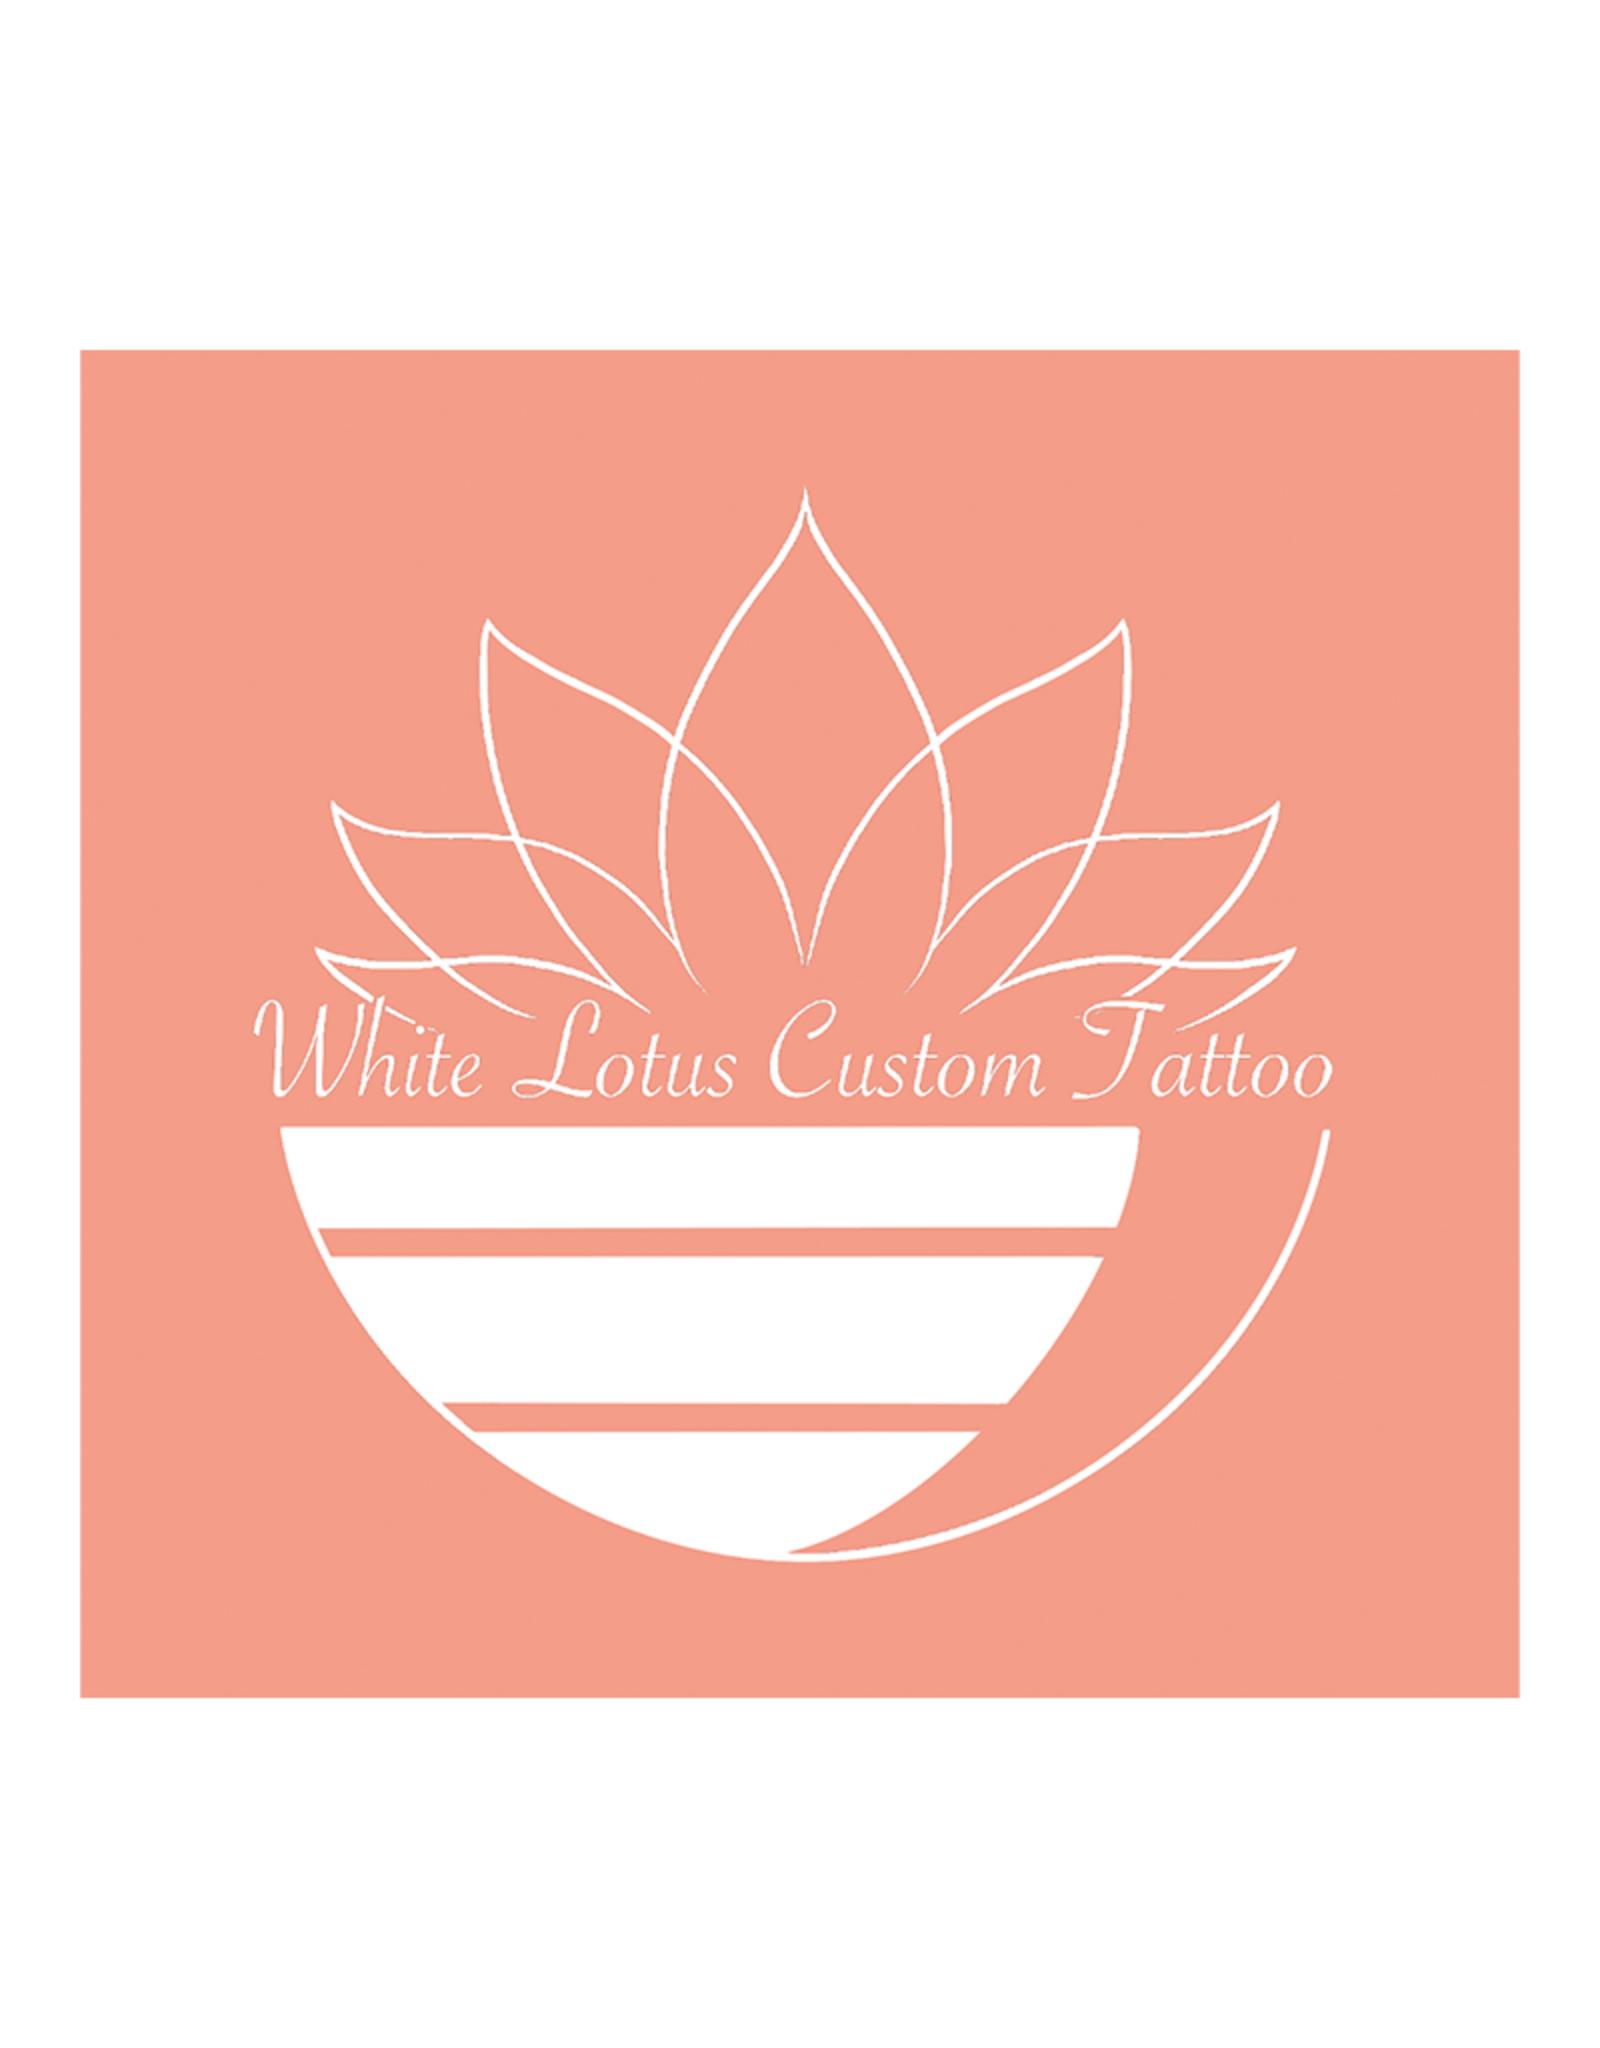 White Lotus Tattoo (Skull Rose Tee)